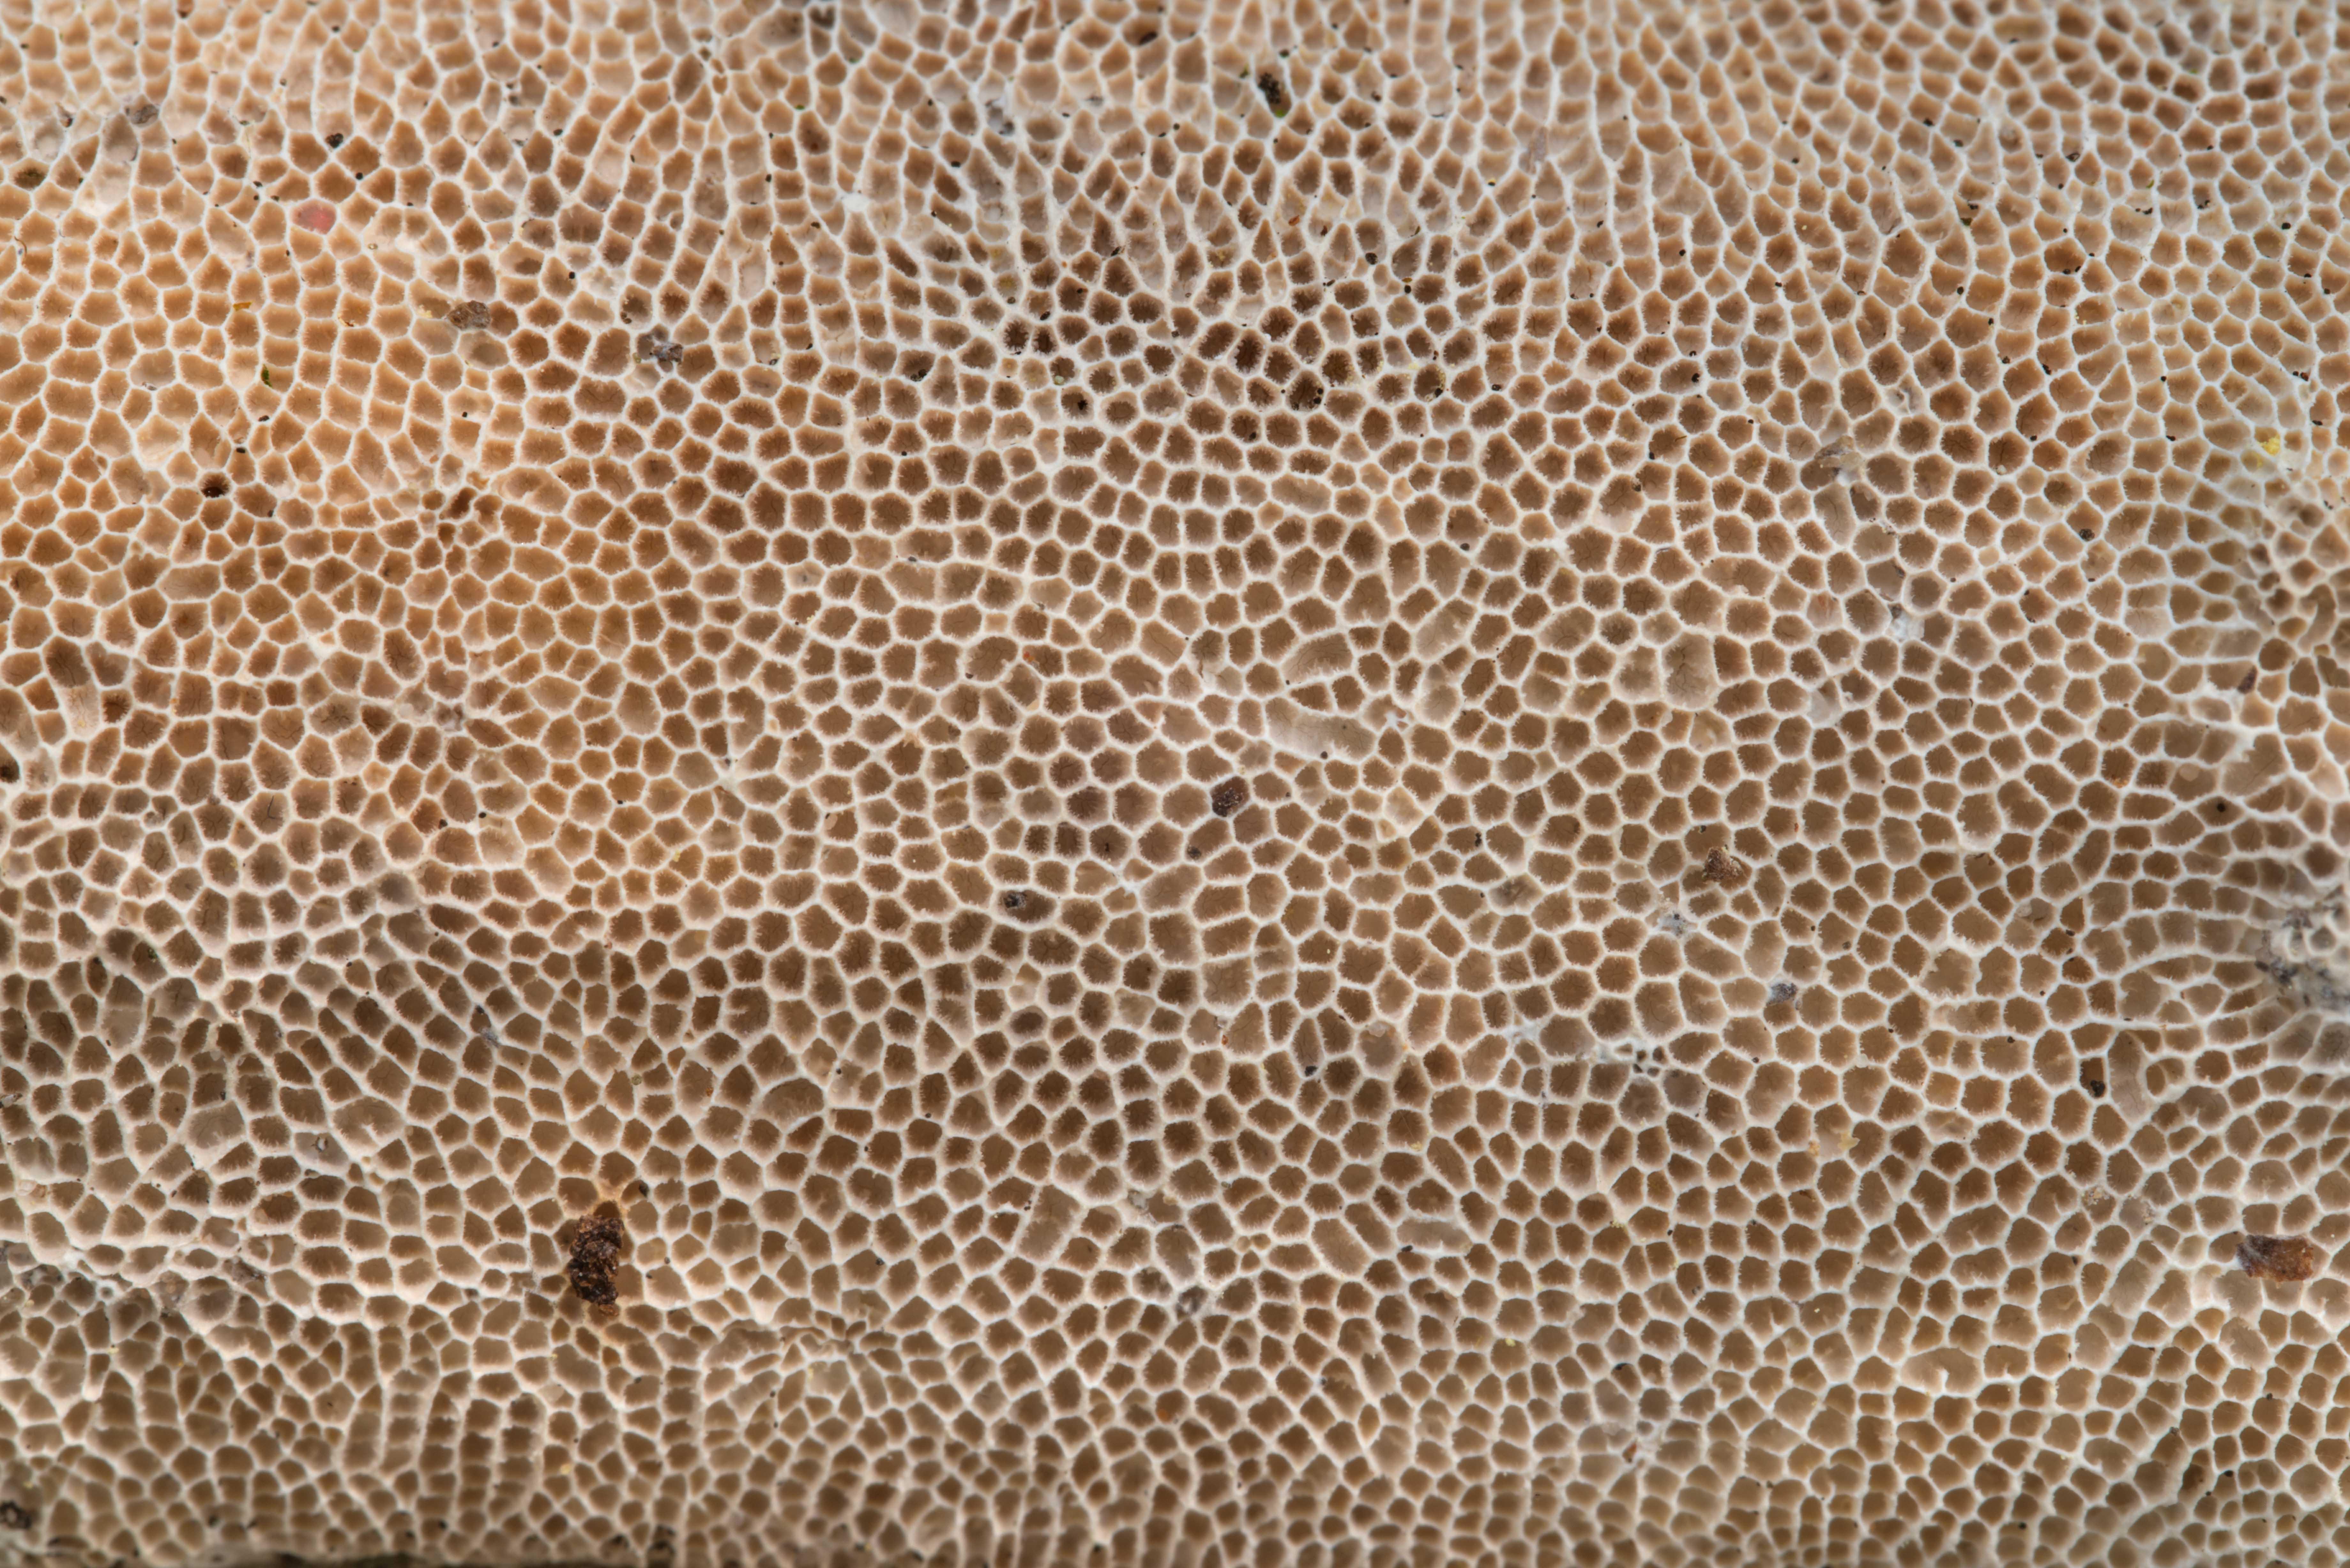 Photo 2234-27: Texture of a porous mushroom Trametes ...